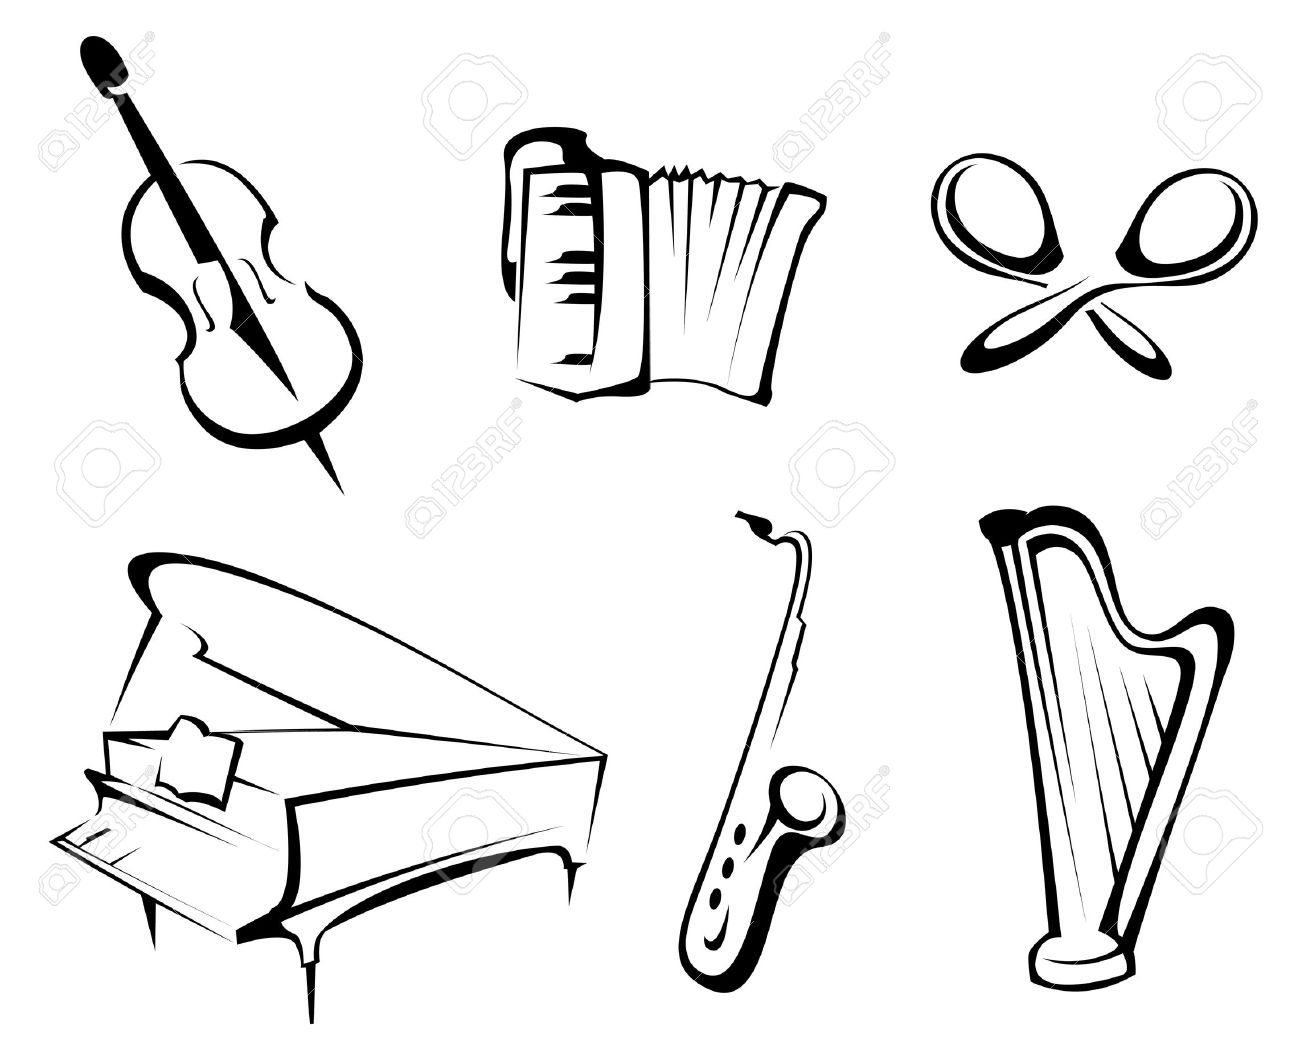 Musical instruments set for design and decorate Standard-Bild - 6554170